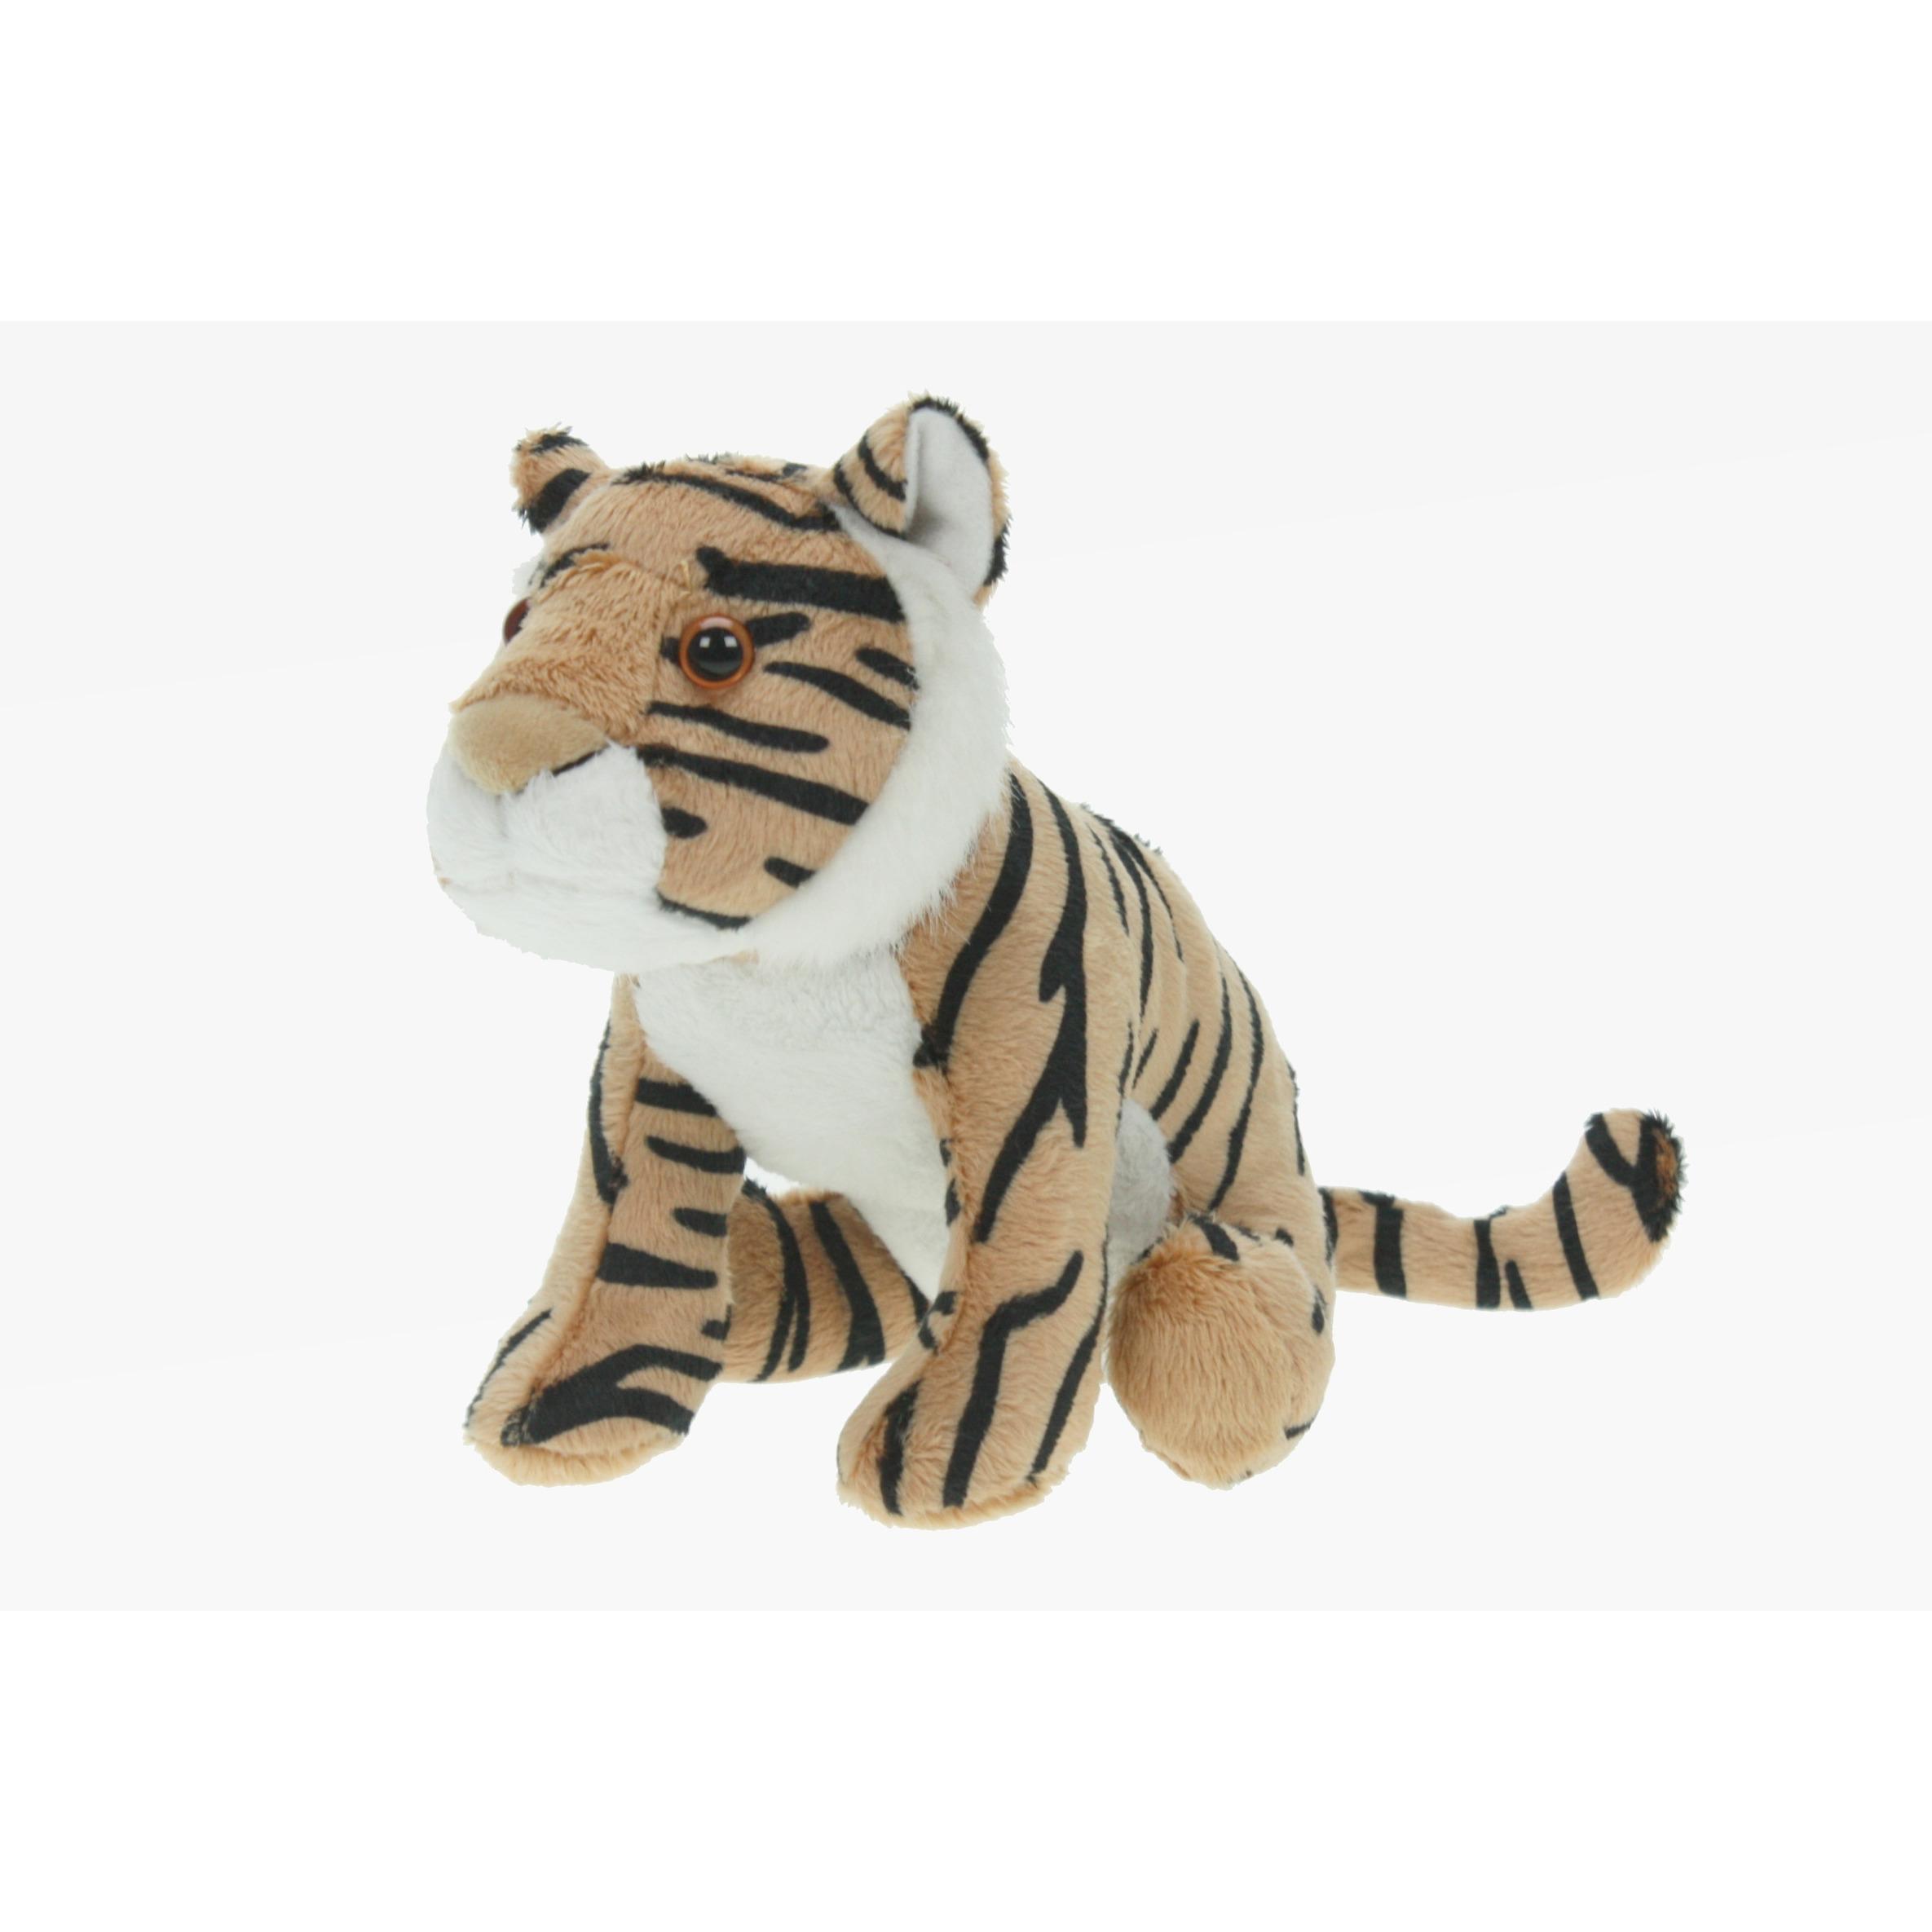 Pluche tijger knuffel bruin 23 cm speelgoed knuffeldier